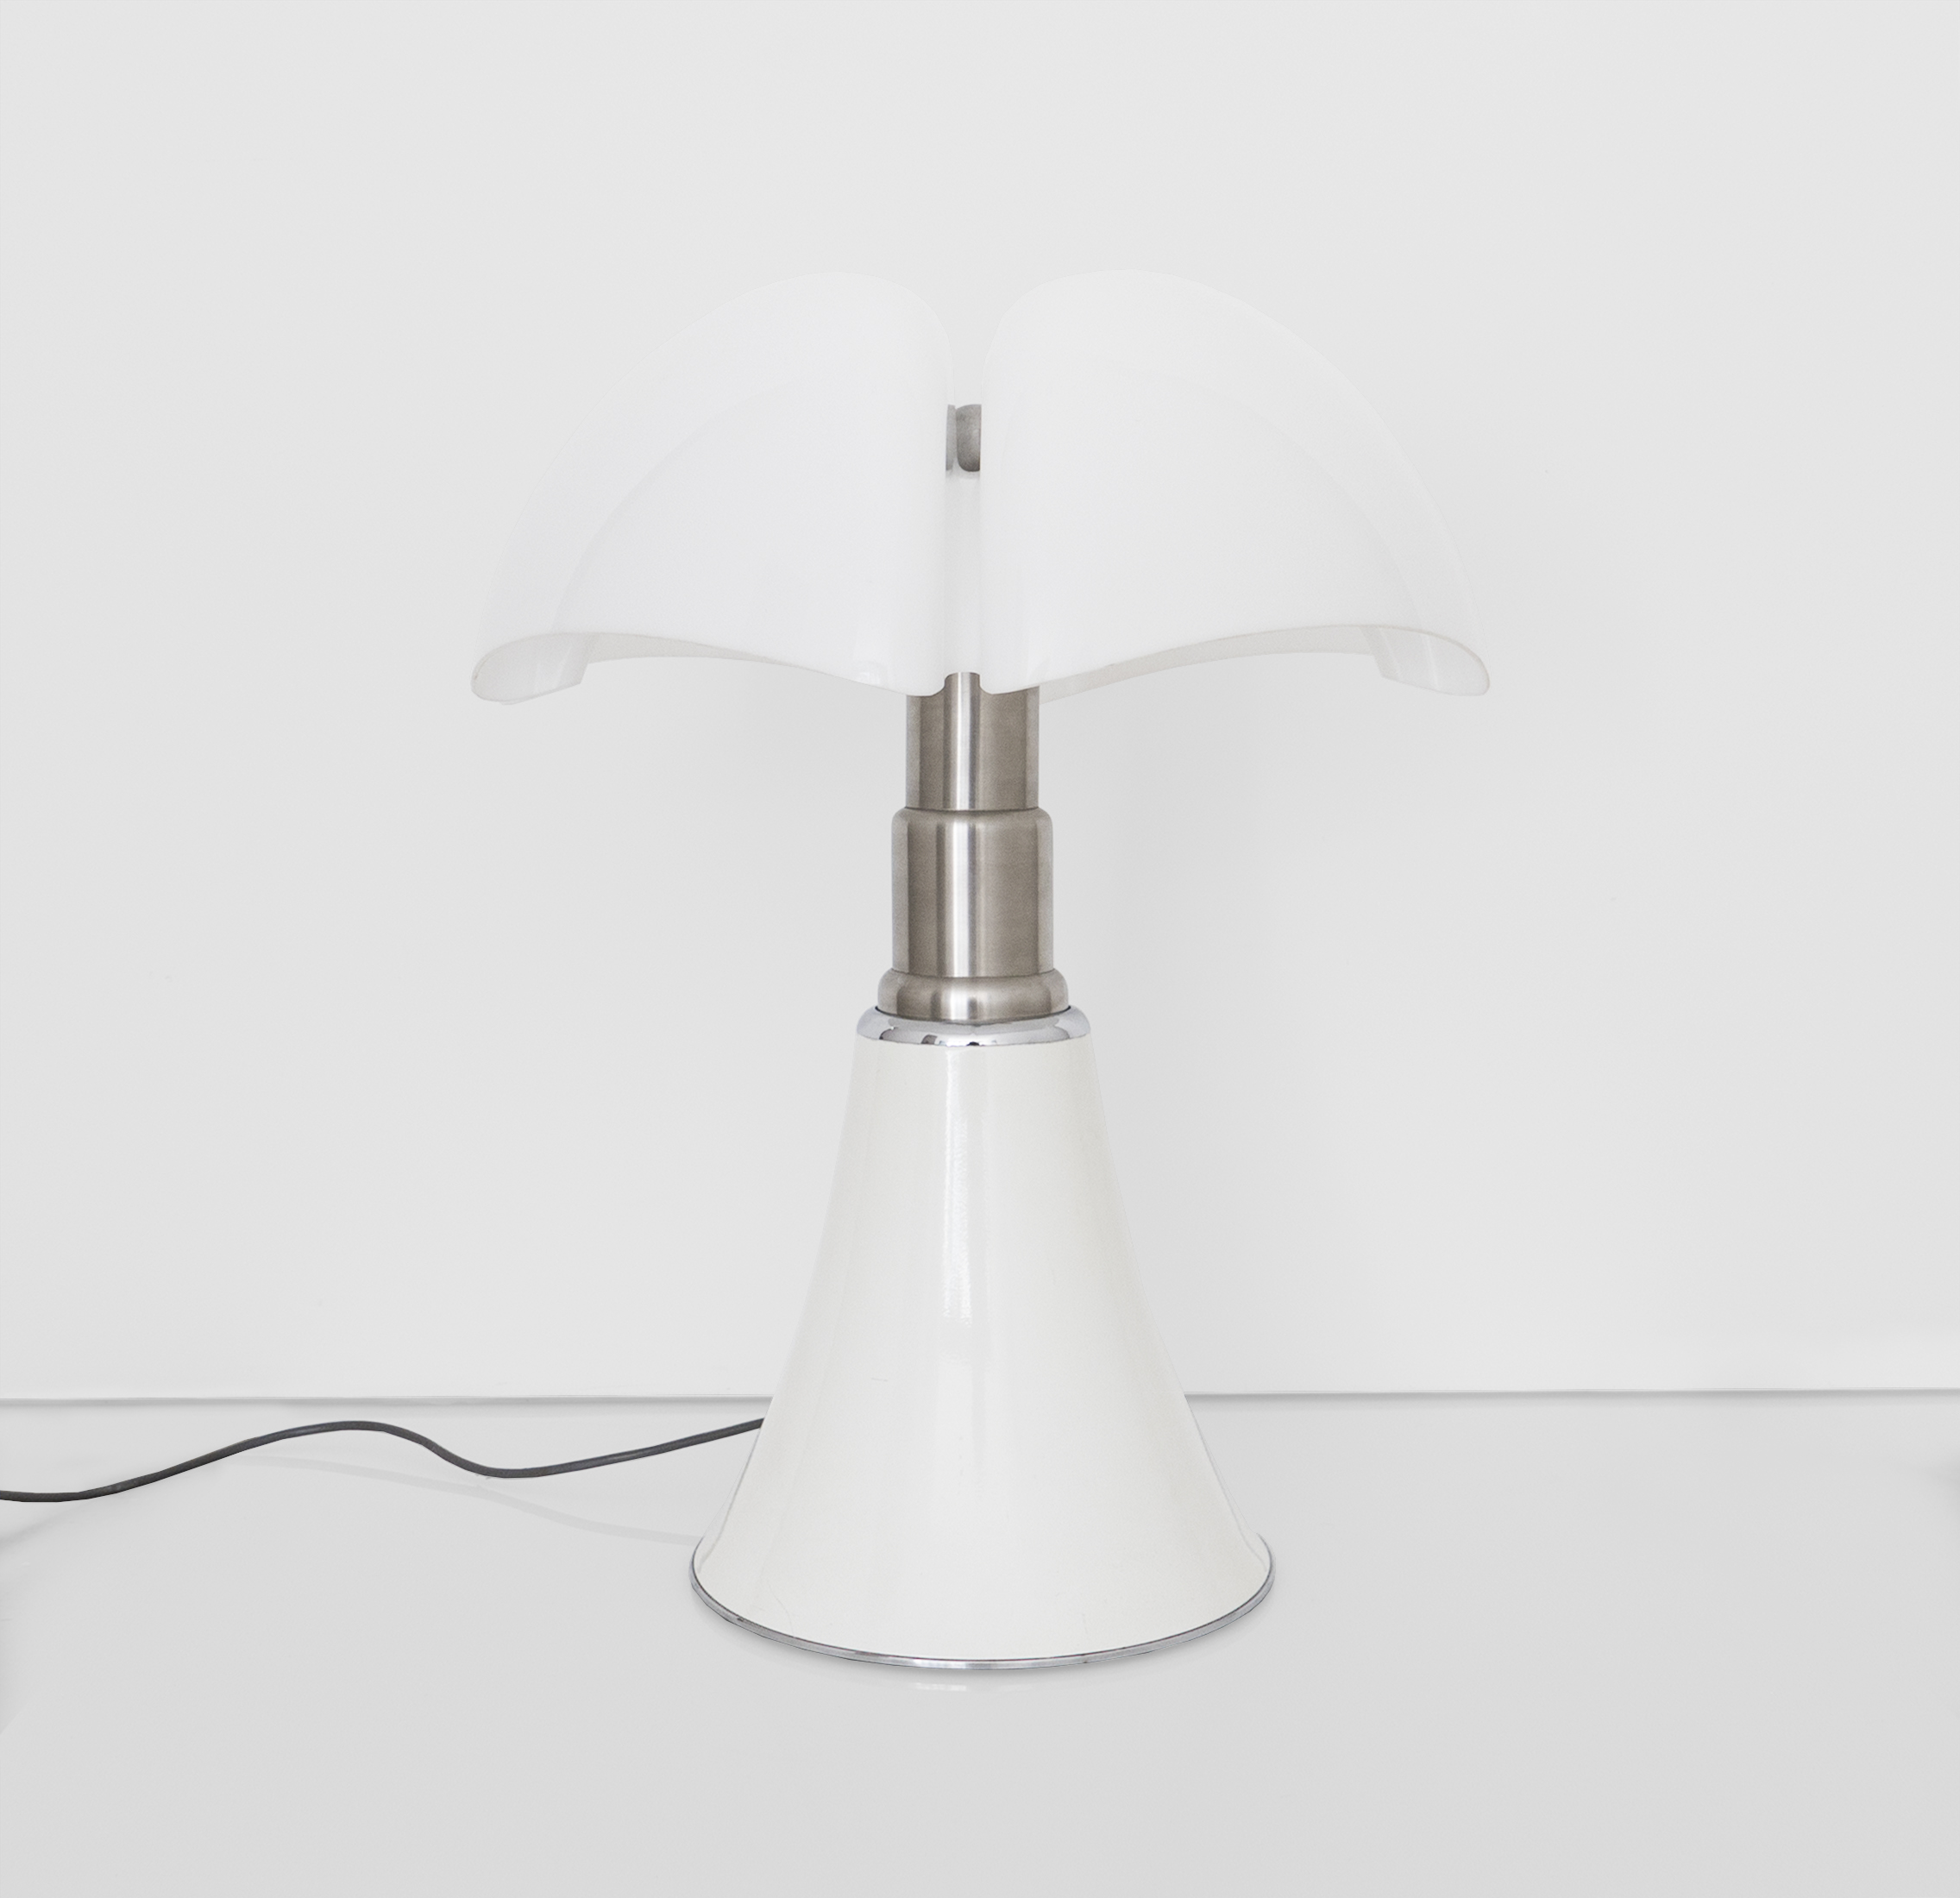 Gae Aulenti, Pipistrello Table Lamp Designed For Martinelli Luce, c. 1960s, Methacrylate, metal, 28 H x 21 Diameter inches_1.jpg